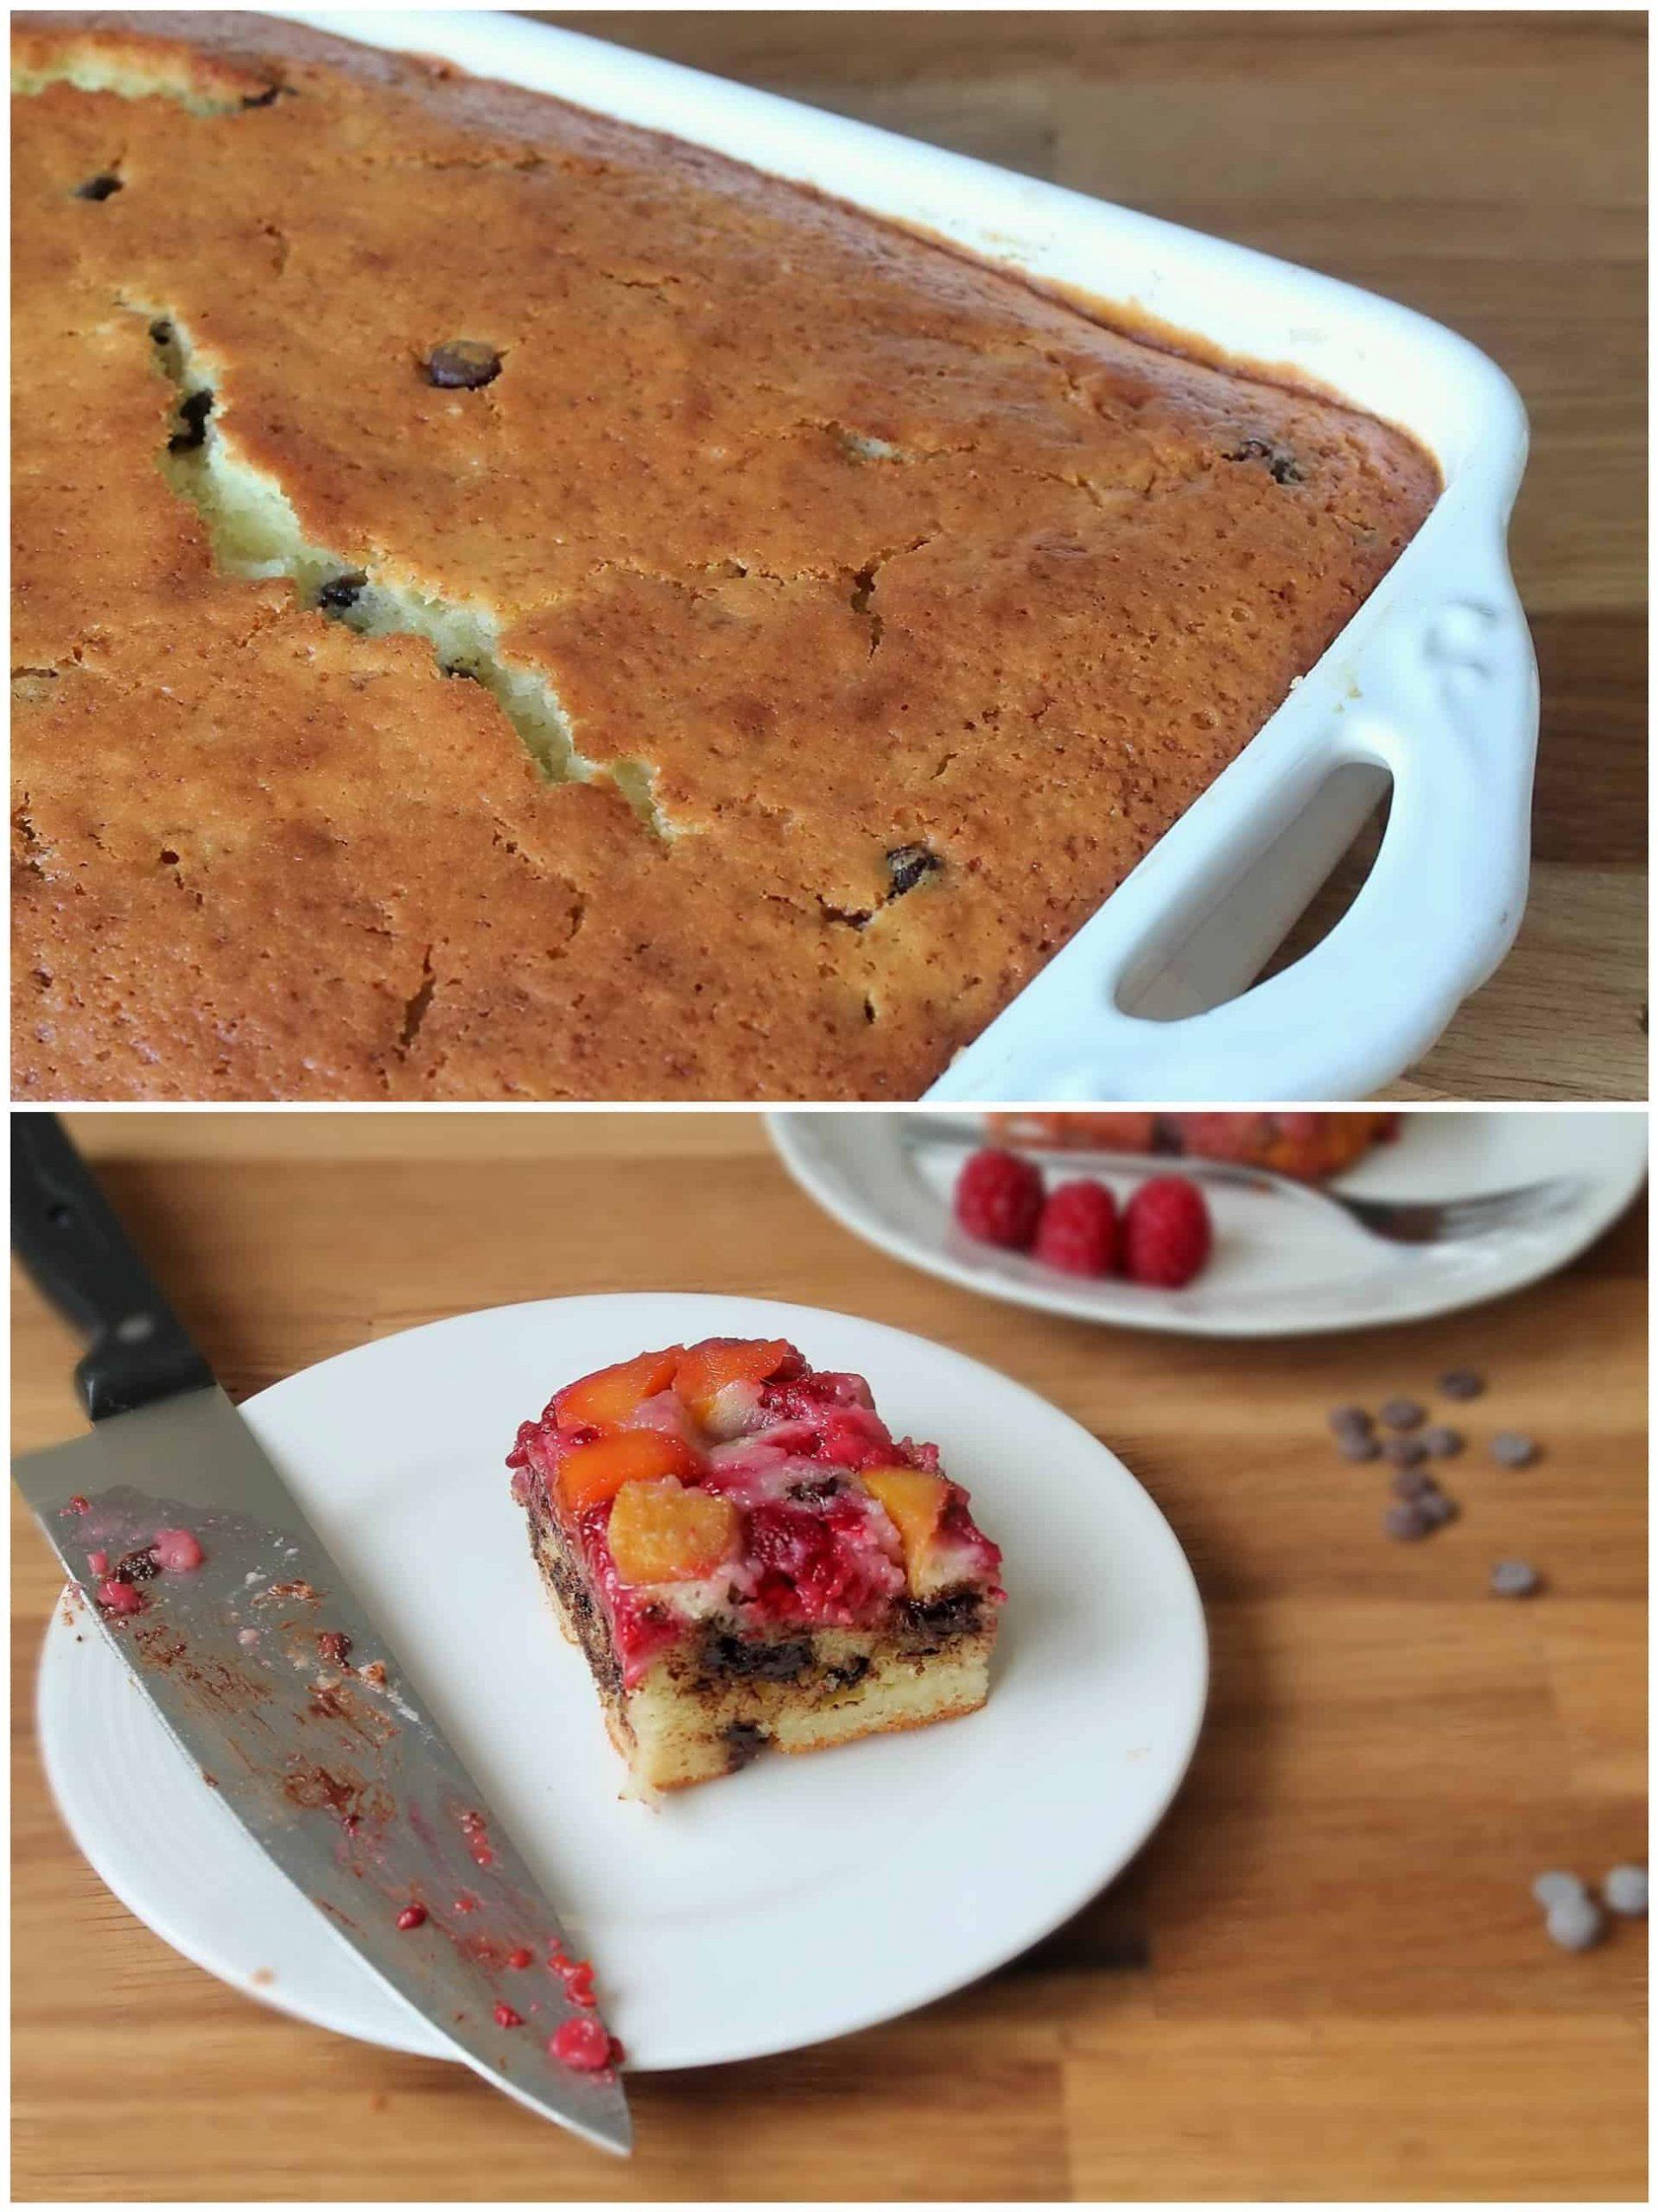 Mango & Raspberry chocolate chip upside down cake - daniscookings.com